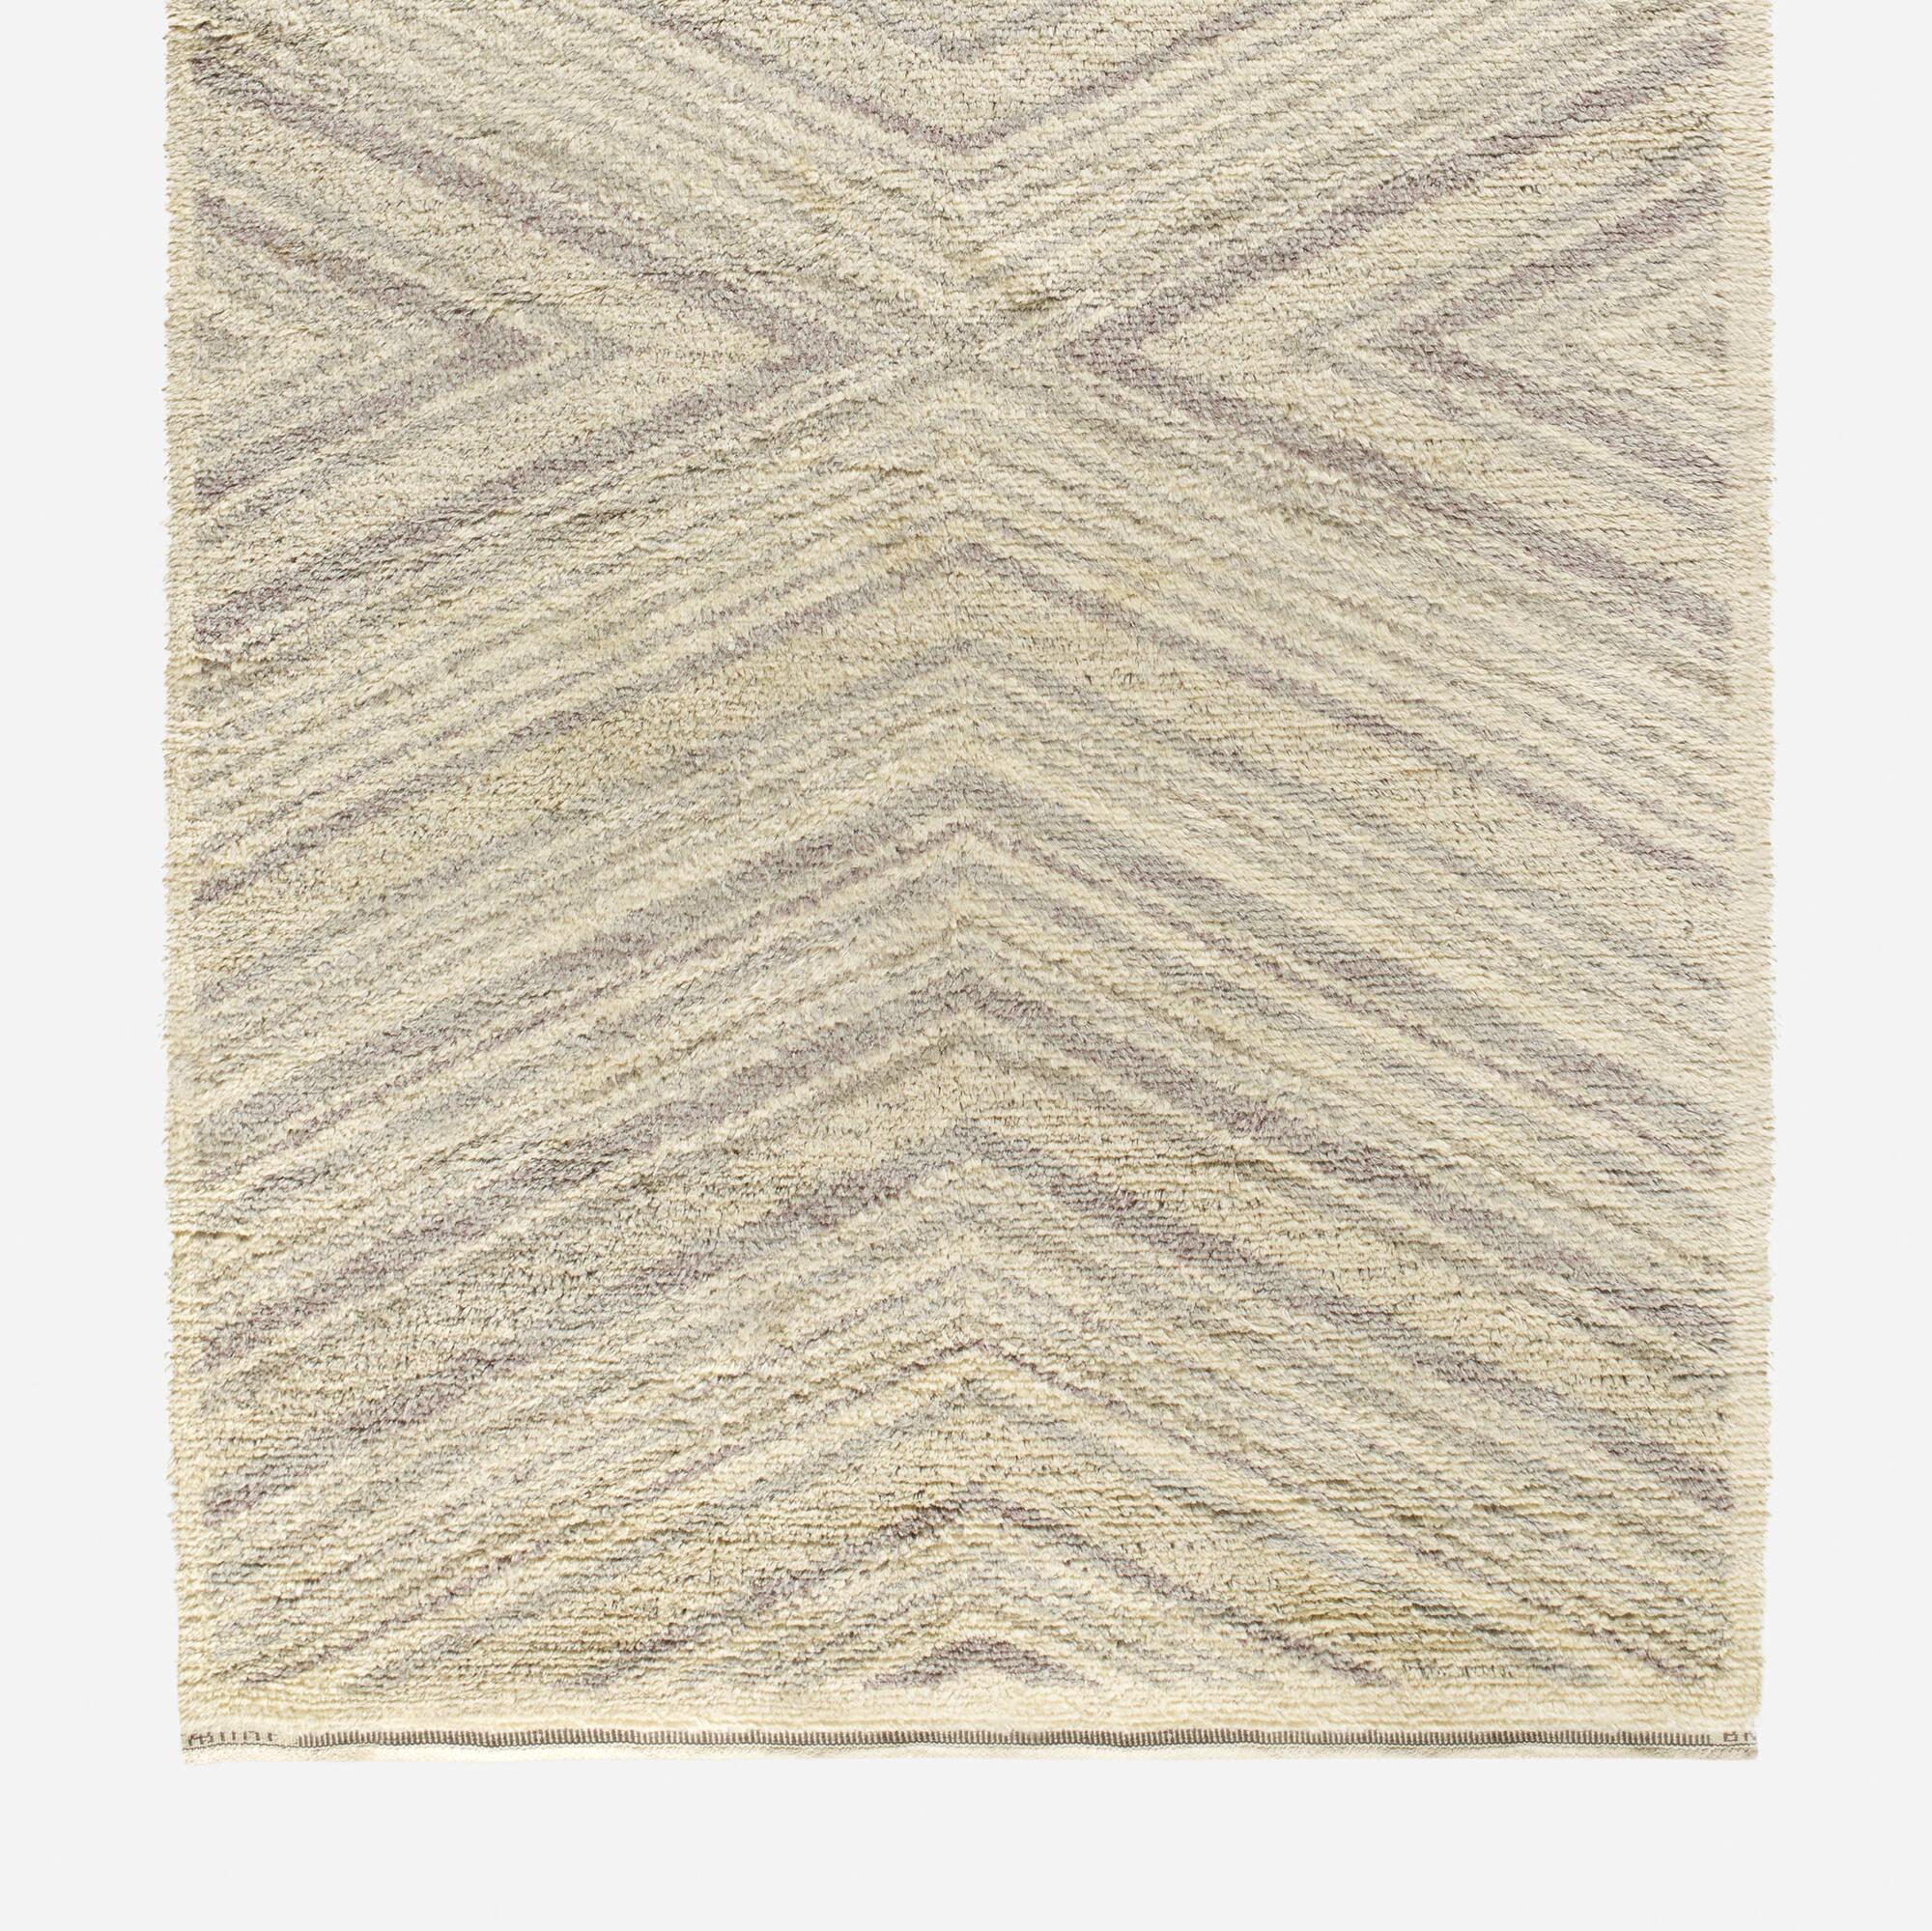 159: Barbro Nilsson / Tigerfällen rya carpet (2 of 2)